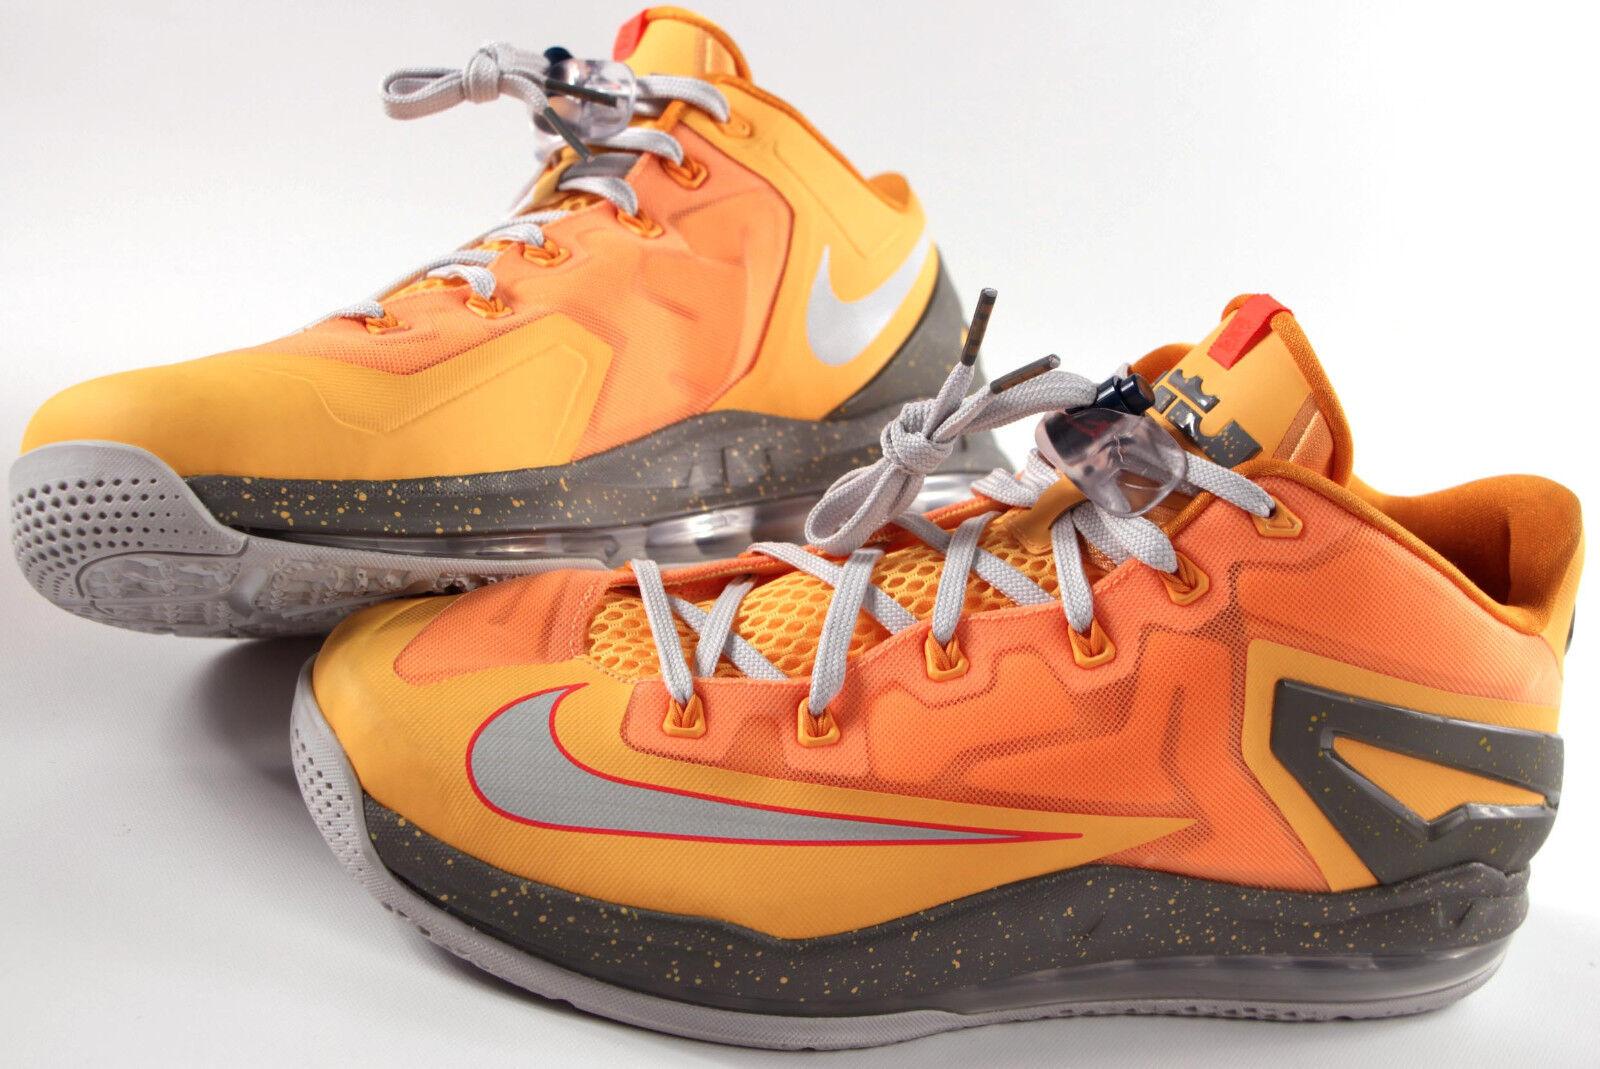 NIKE air Max -170 LEBRON XI Low Shoes-12-New -170 Max LJ James basketball- + Lace locks- 84a14f